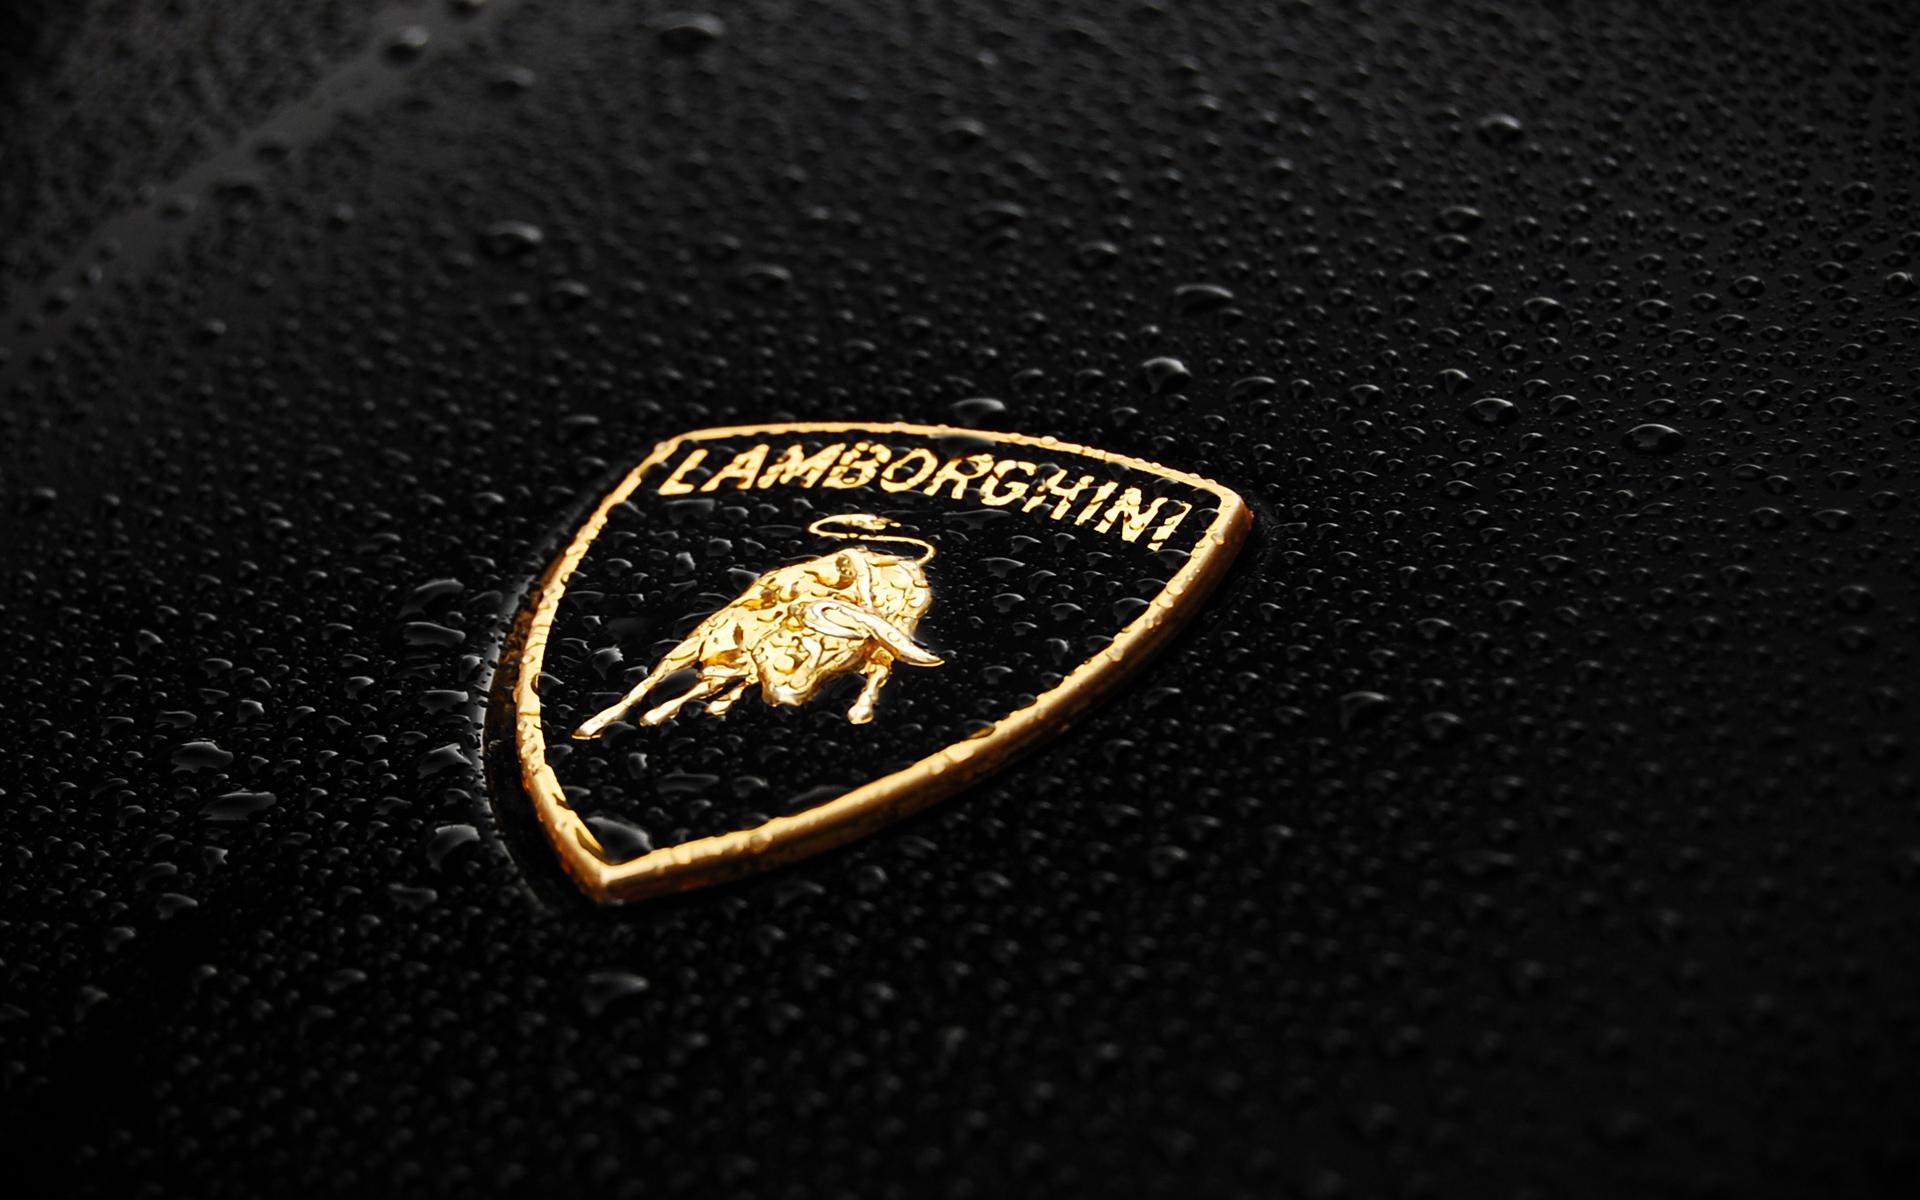 44 Lamborghini Emblem Wallpaper On Wallpapersafari